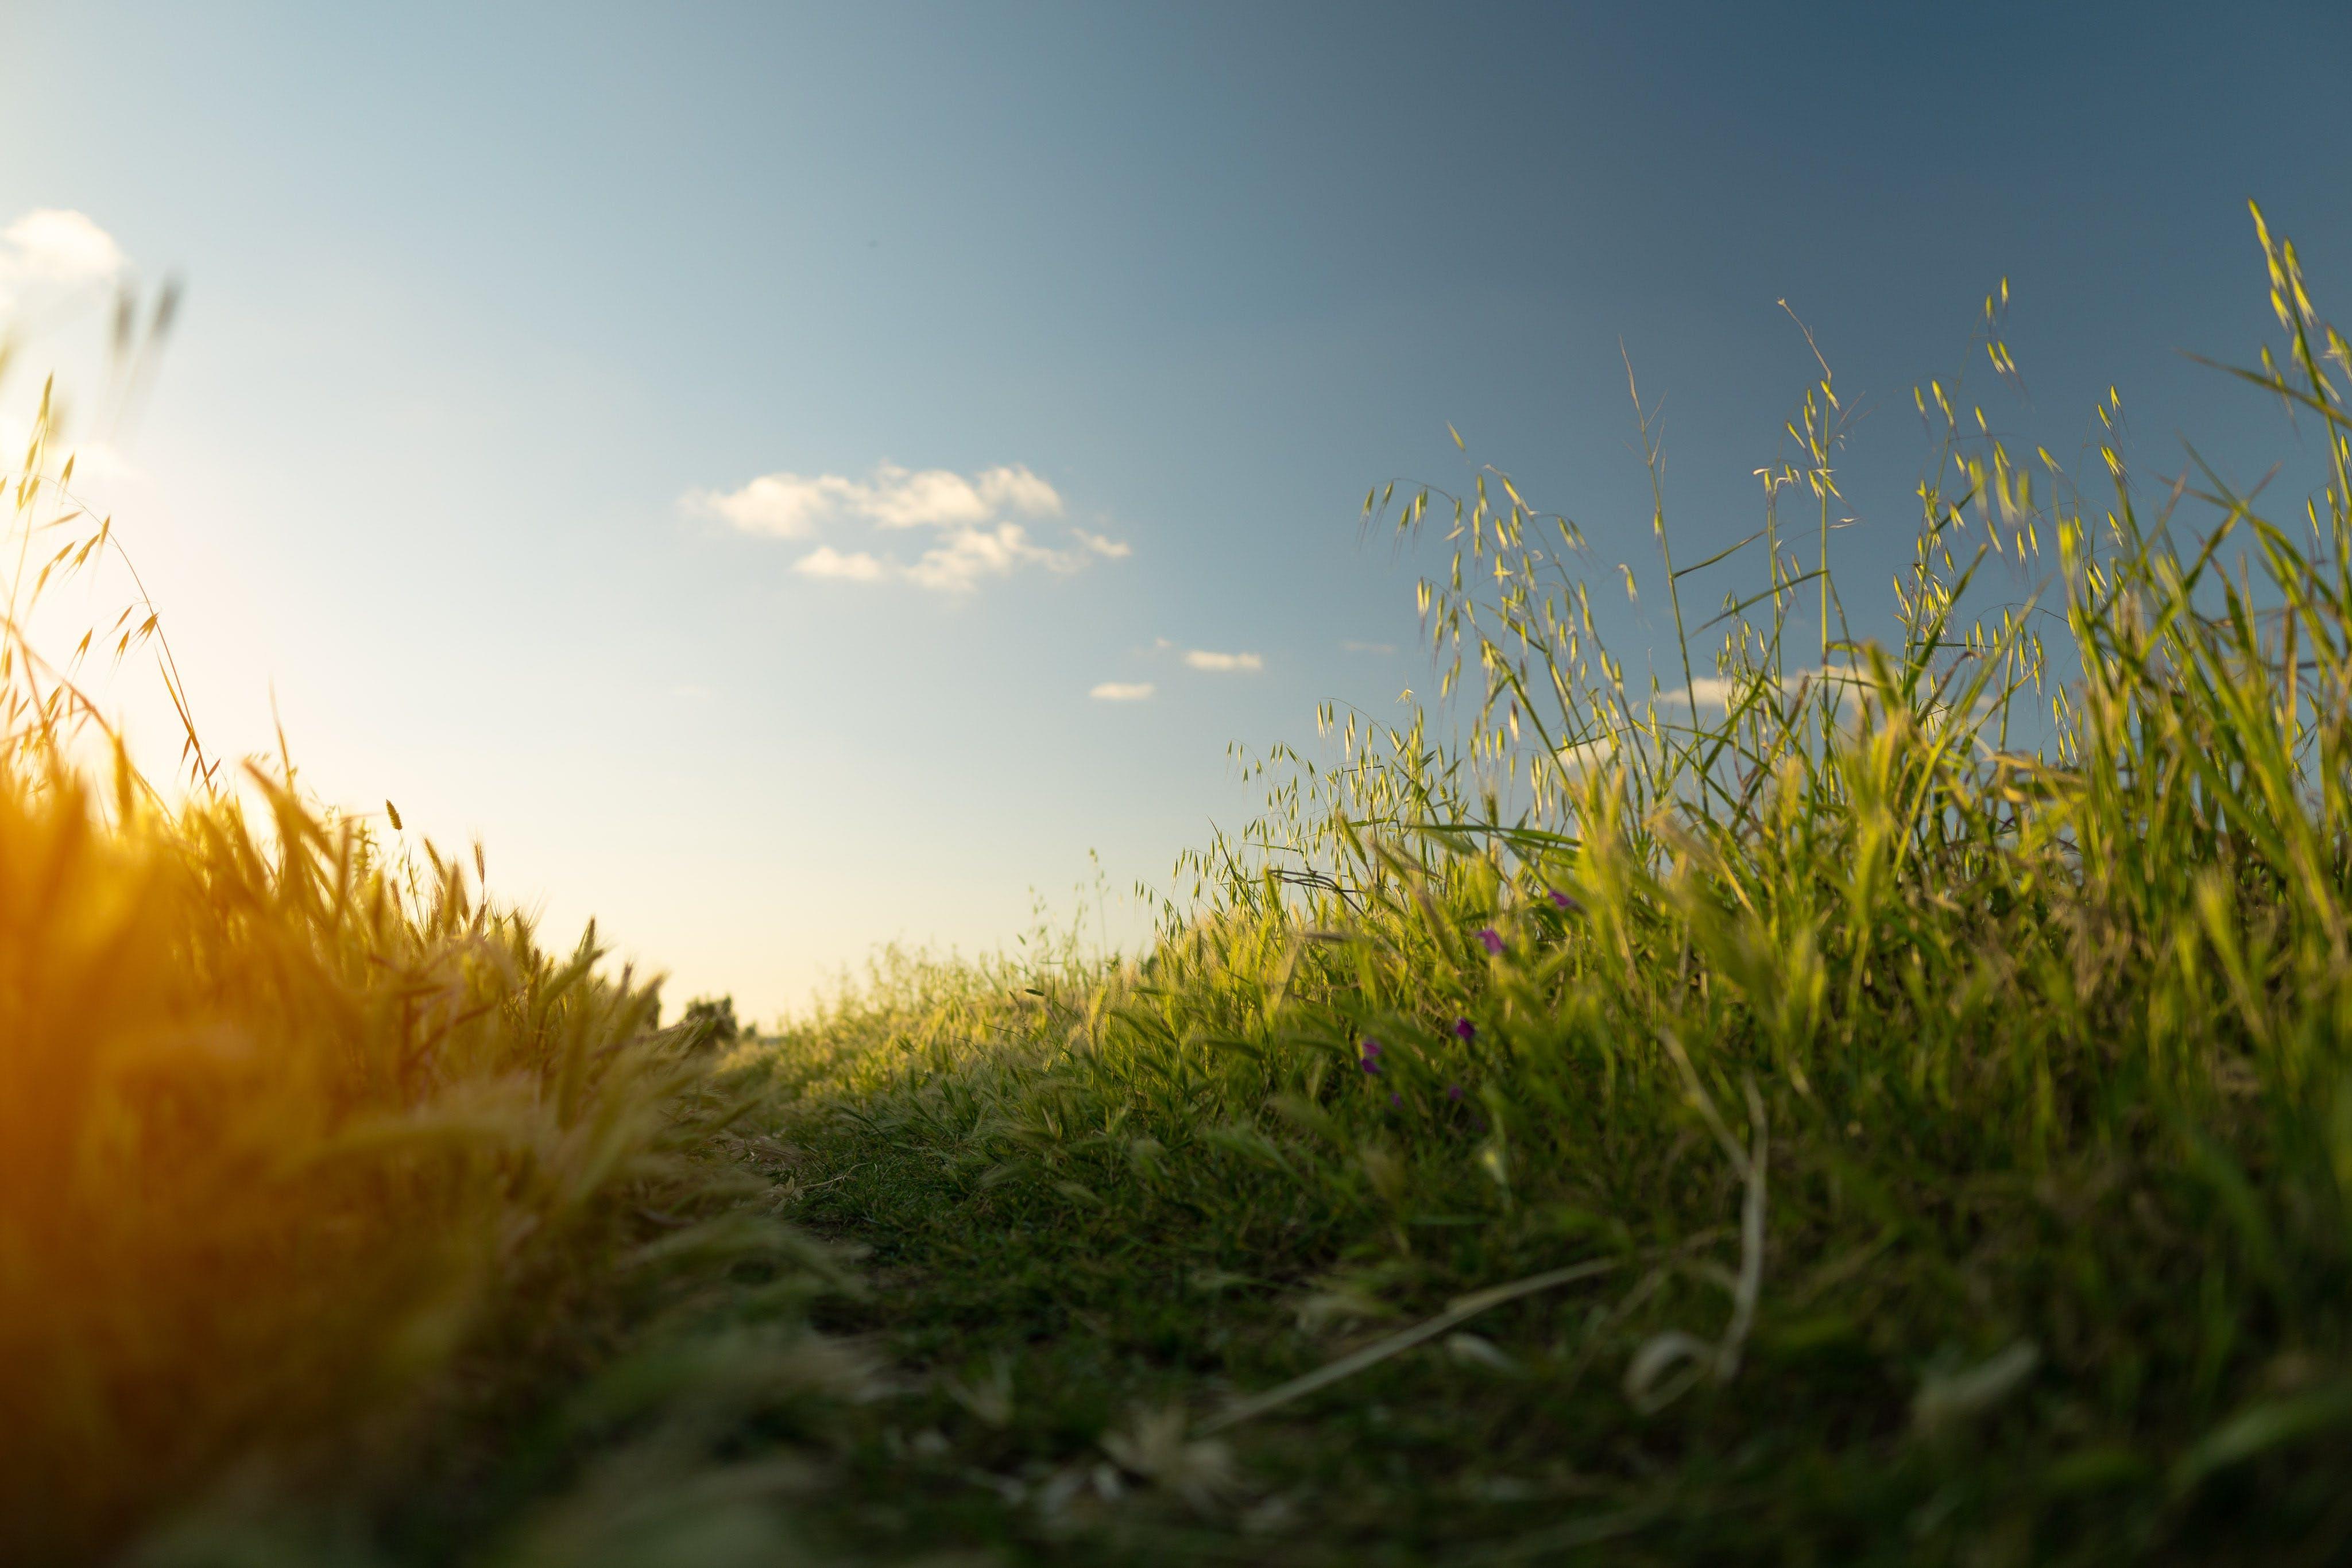 Close-Up Photo of Grass Field